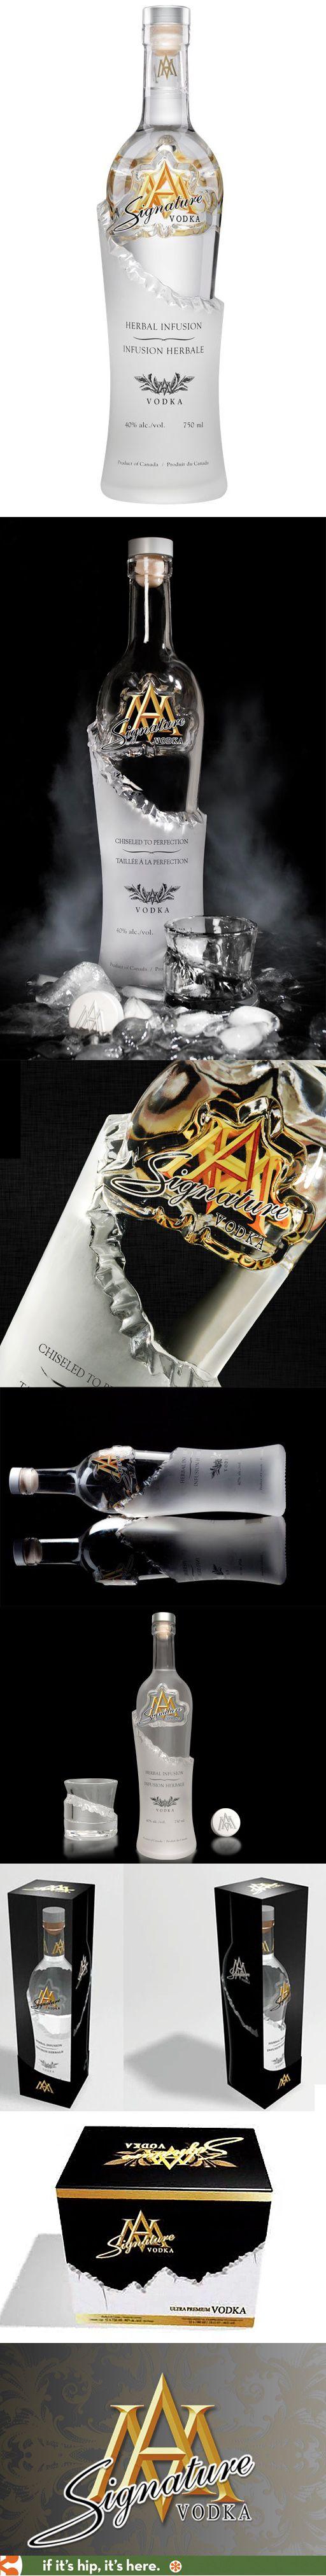 Signature Vodka (herbal-infused) in an unusual chiseled bottle design #packaging #design